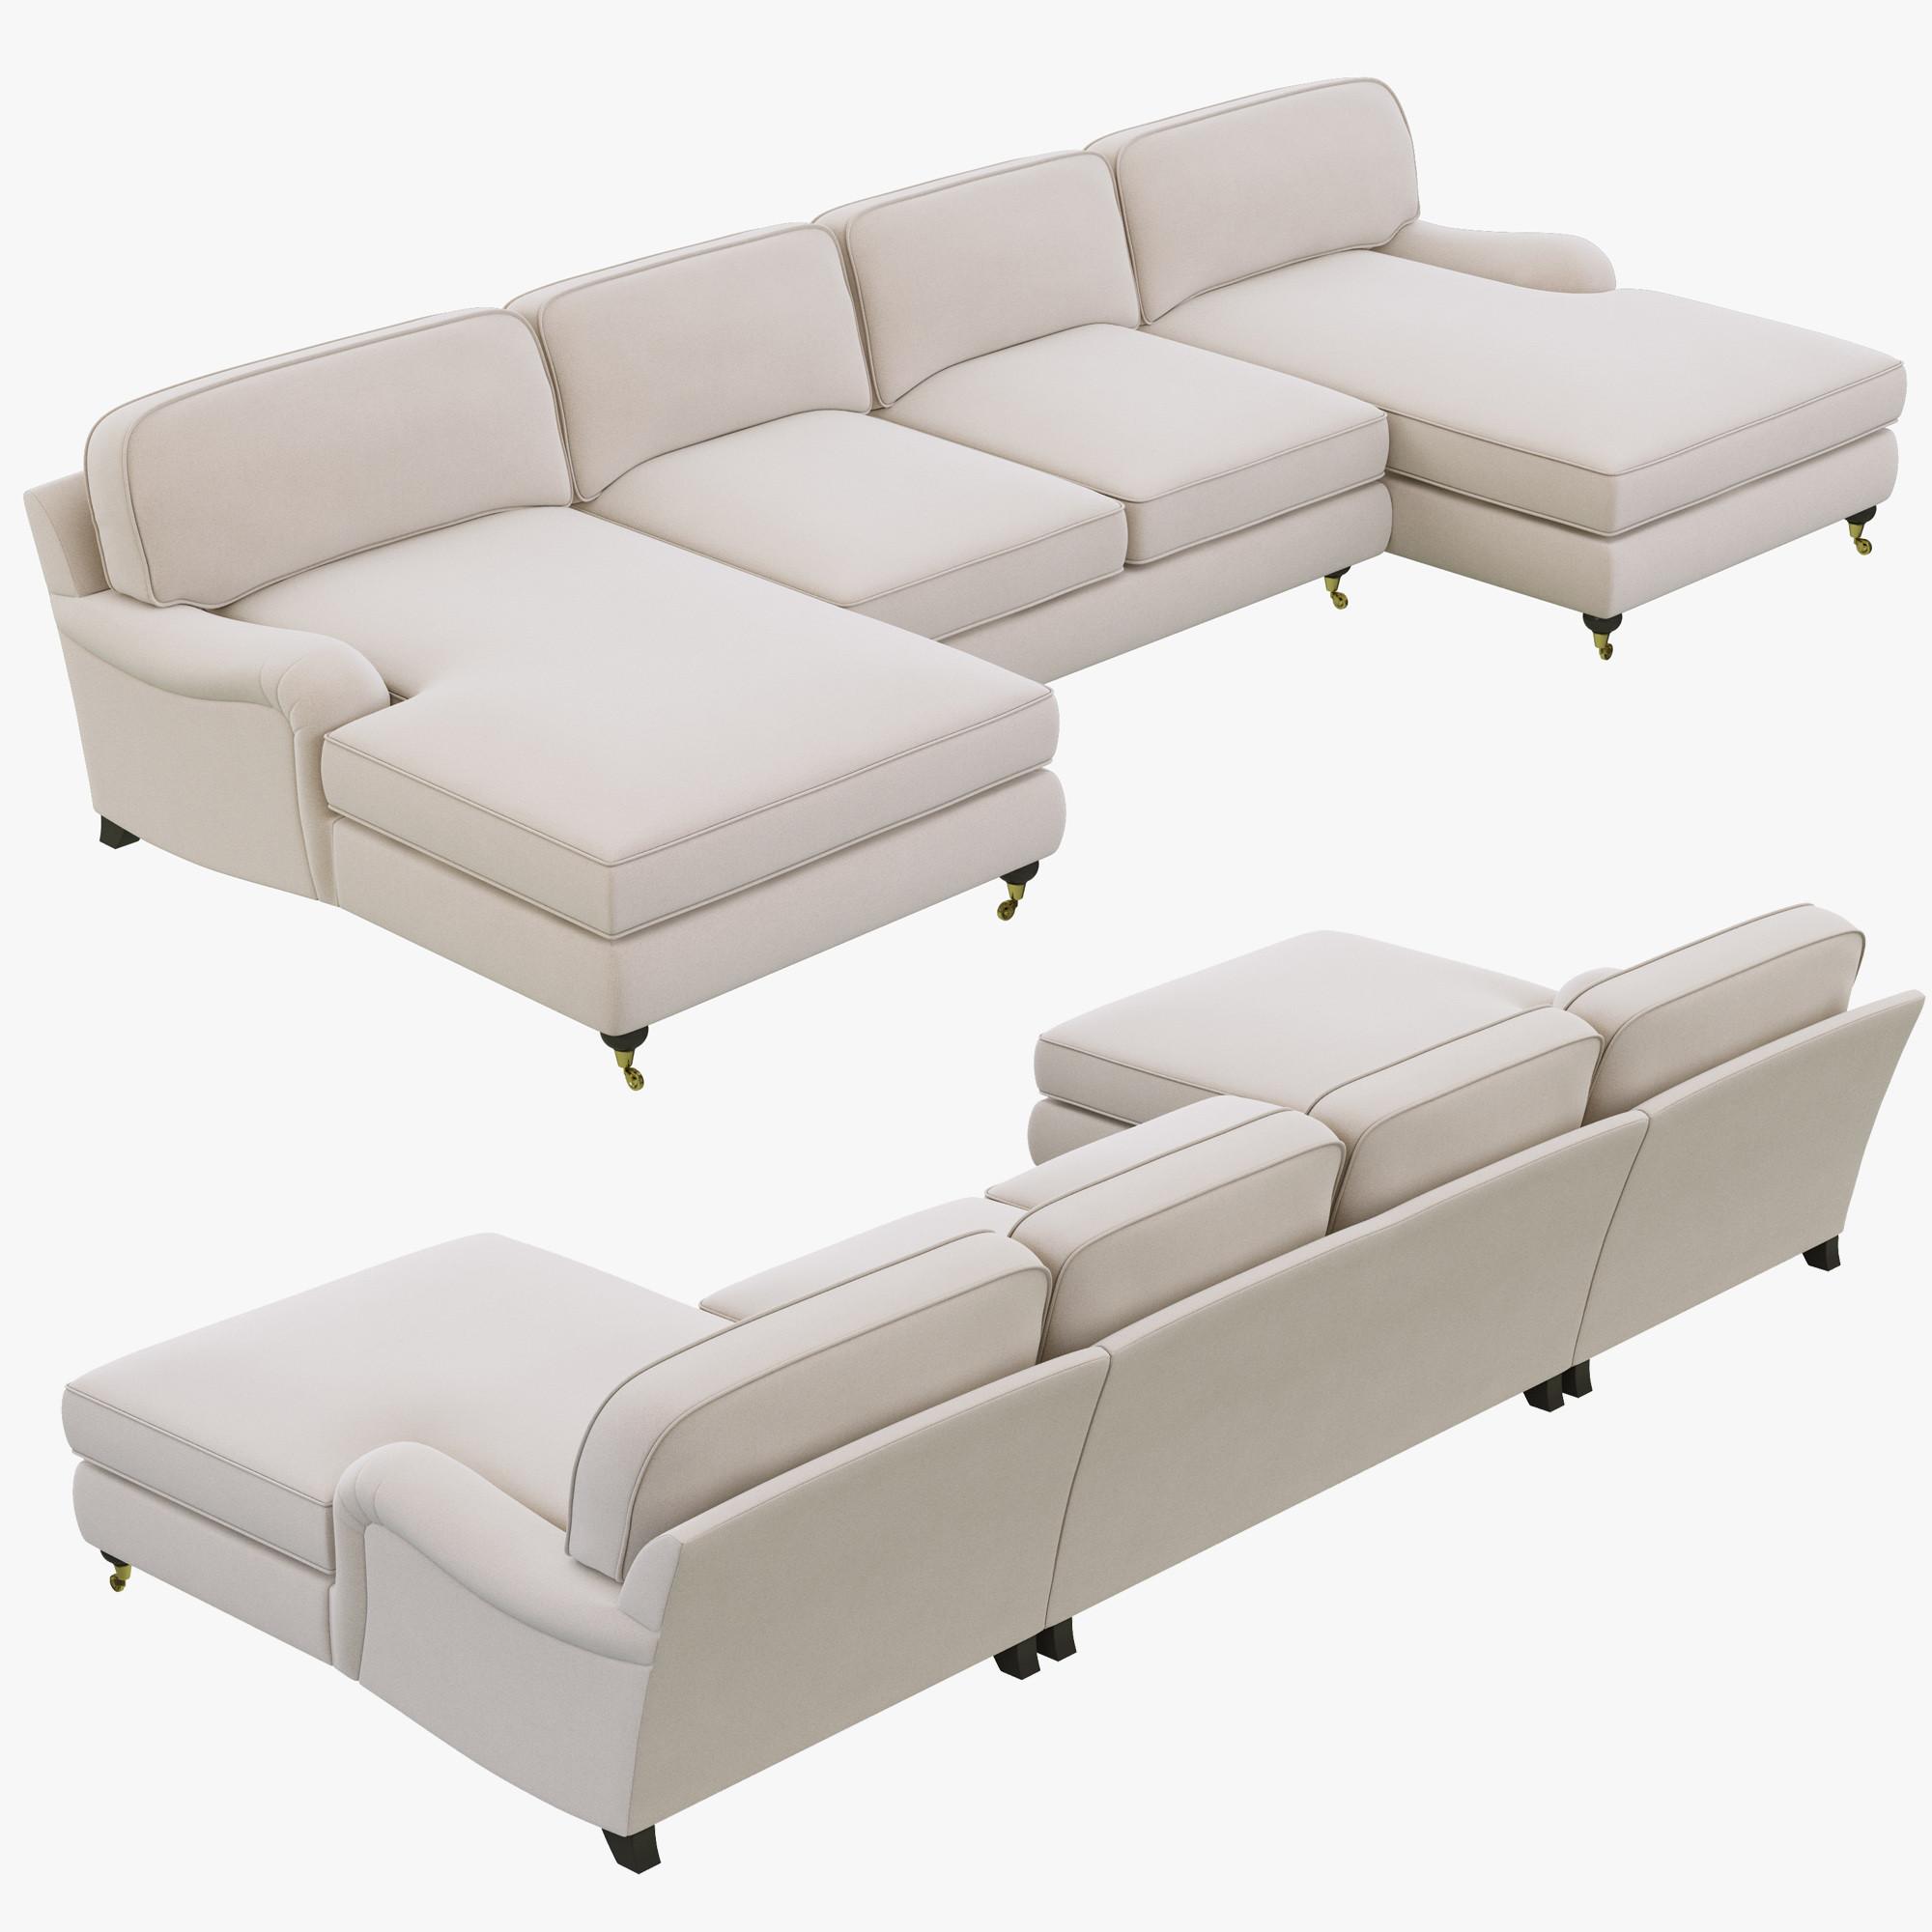 english arm sofa restoration hardware chartreuse tufted 3d roll model